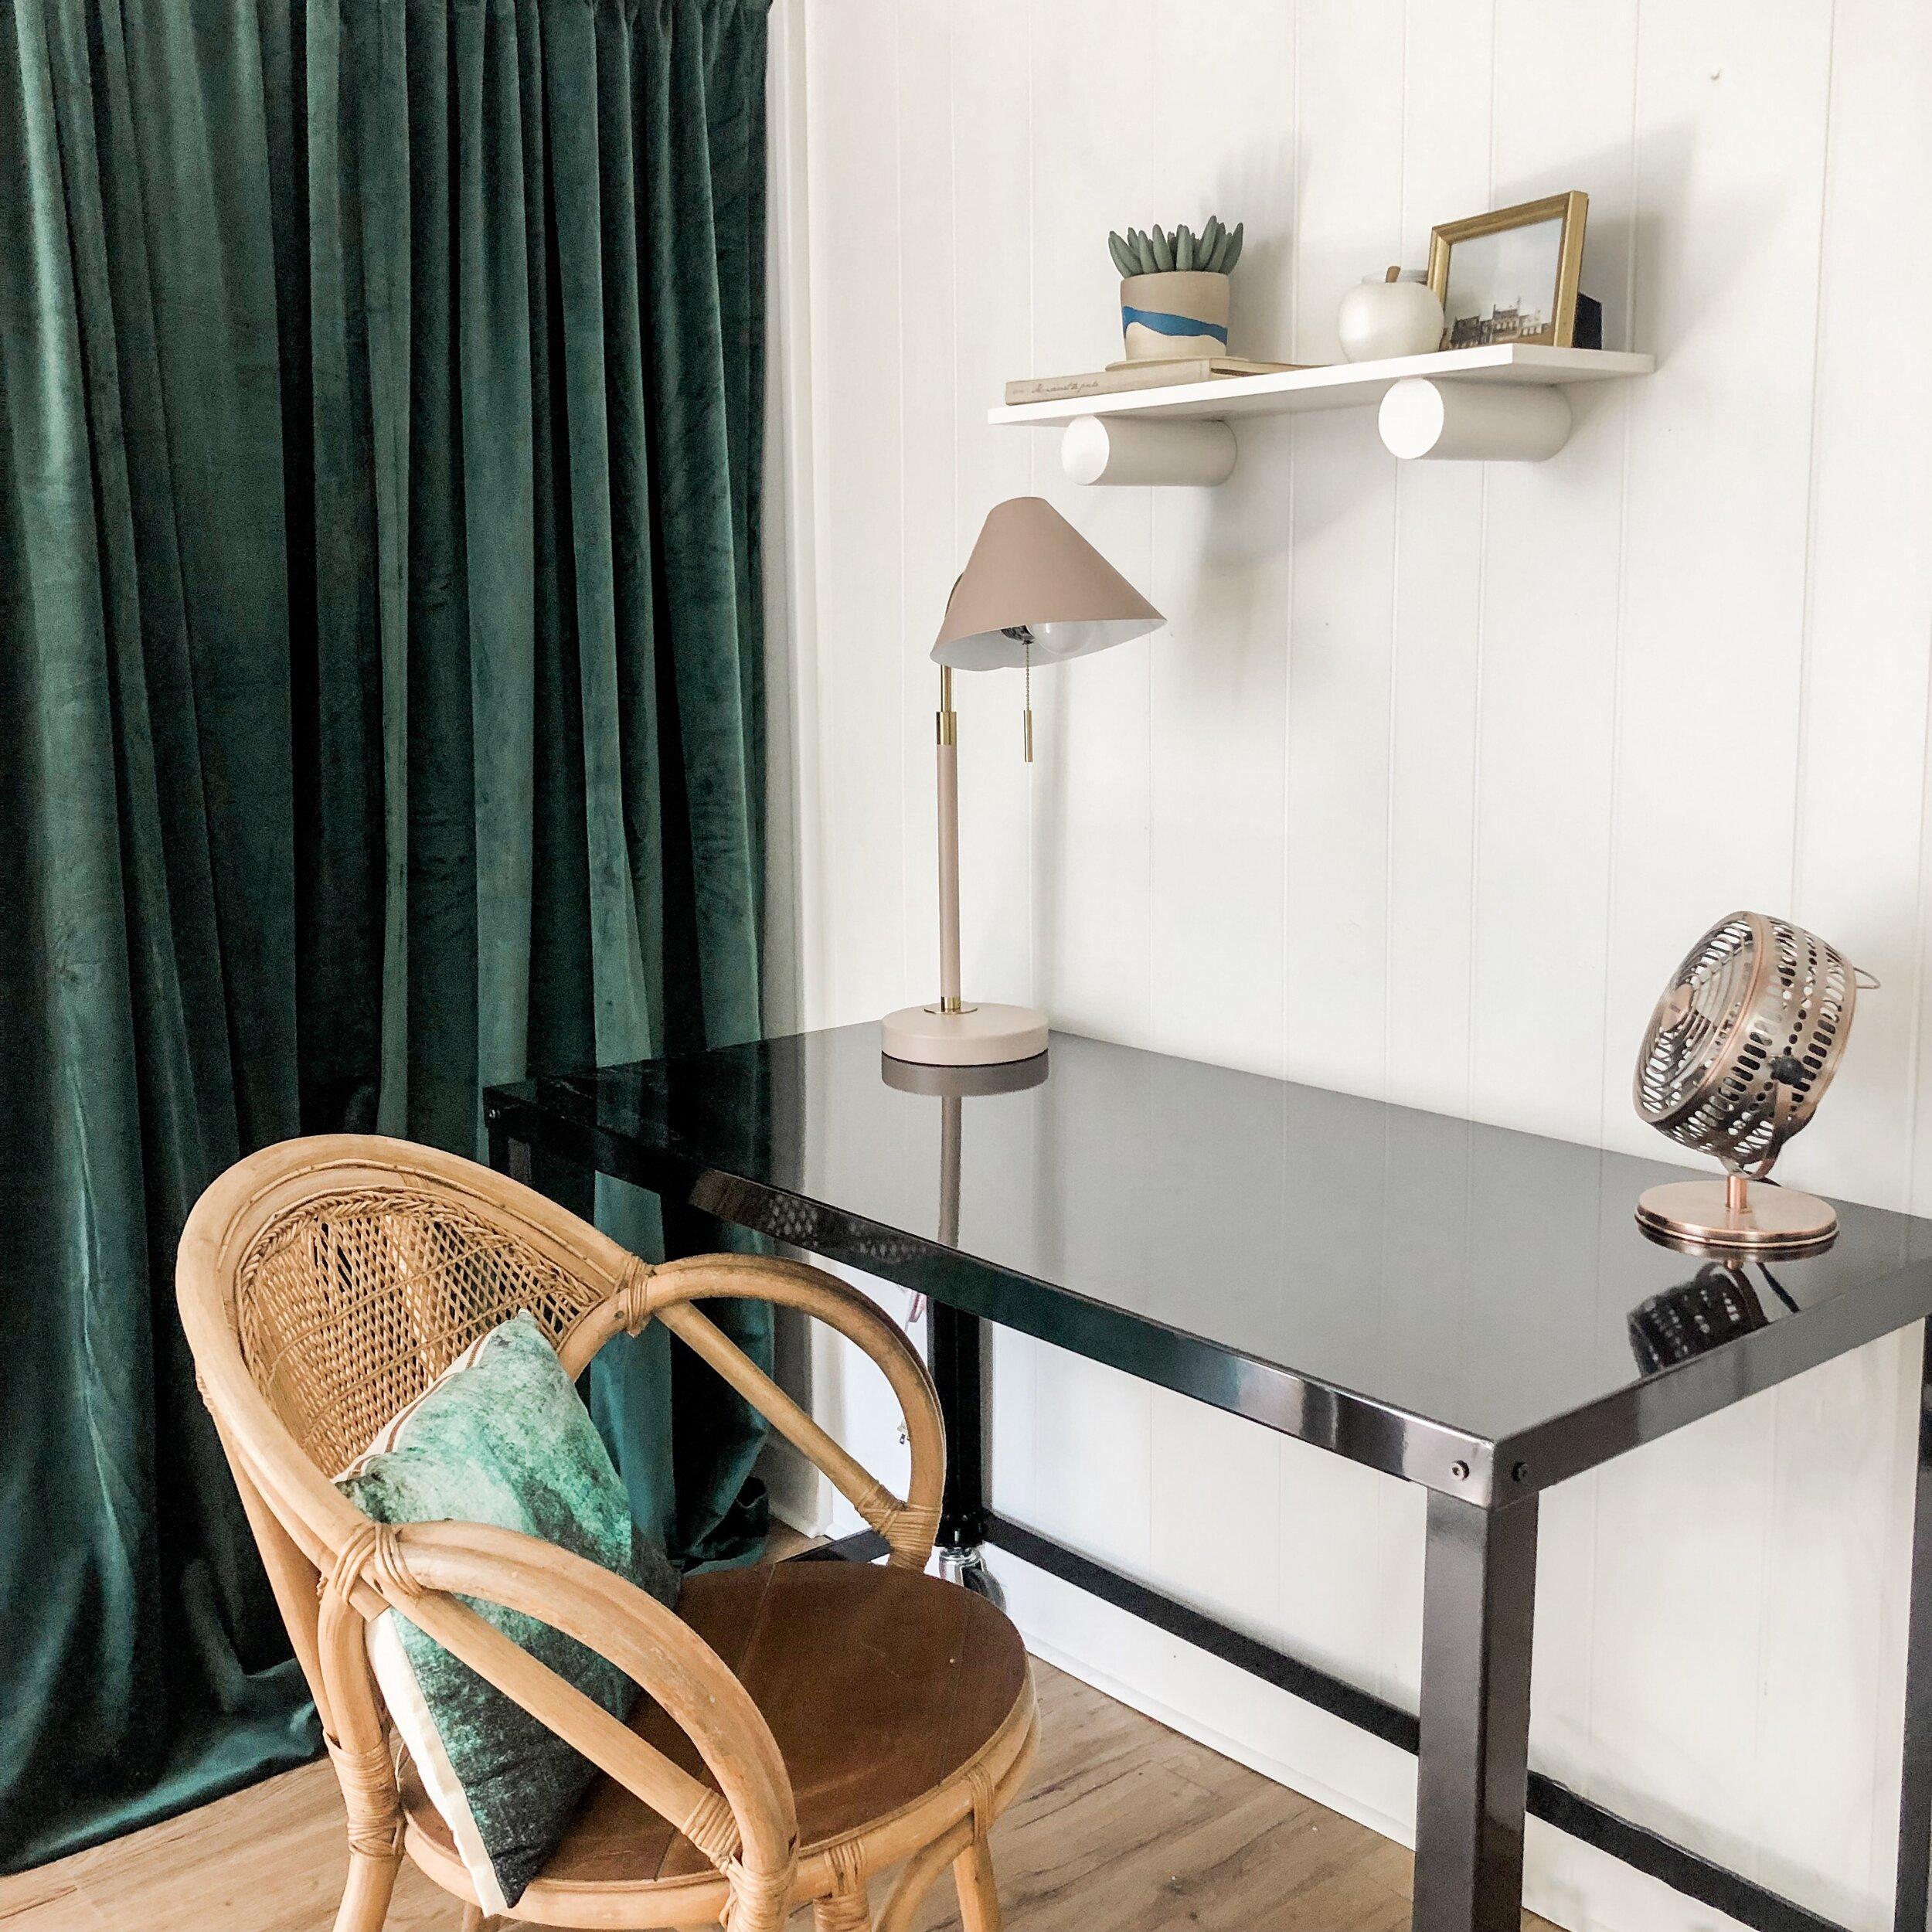 Shelf:  West Elm  Lamp:  West Elm  Curtains: Amazon Desk:  Wayfair